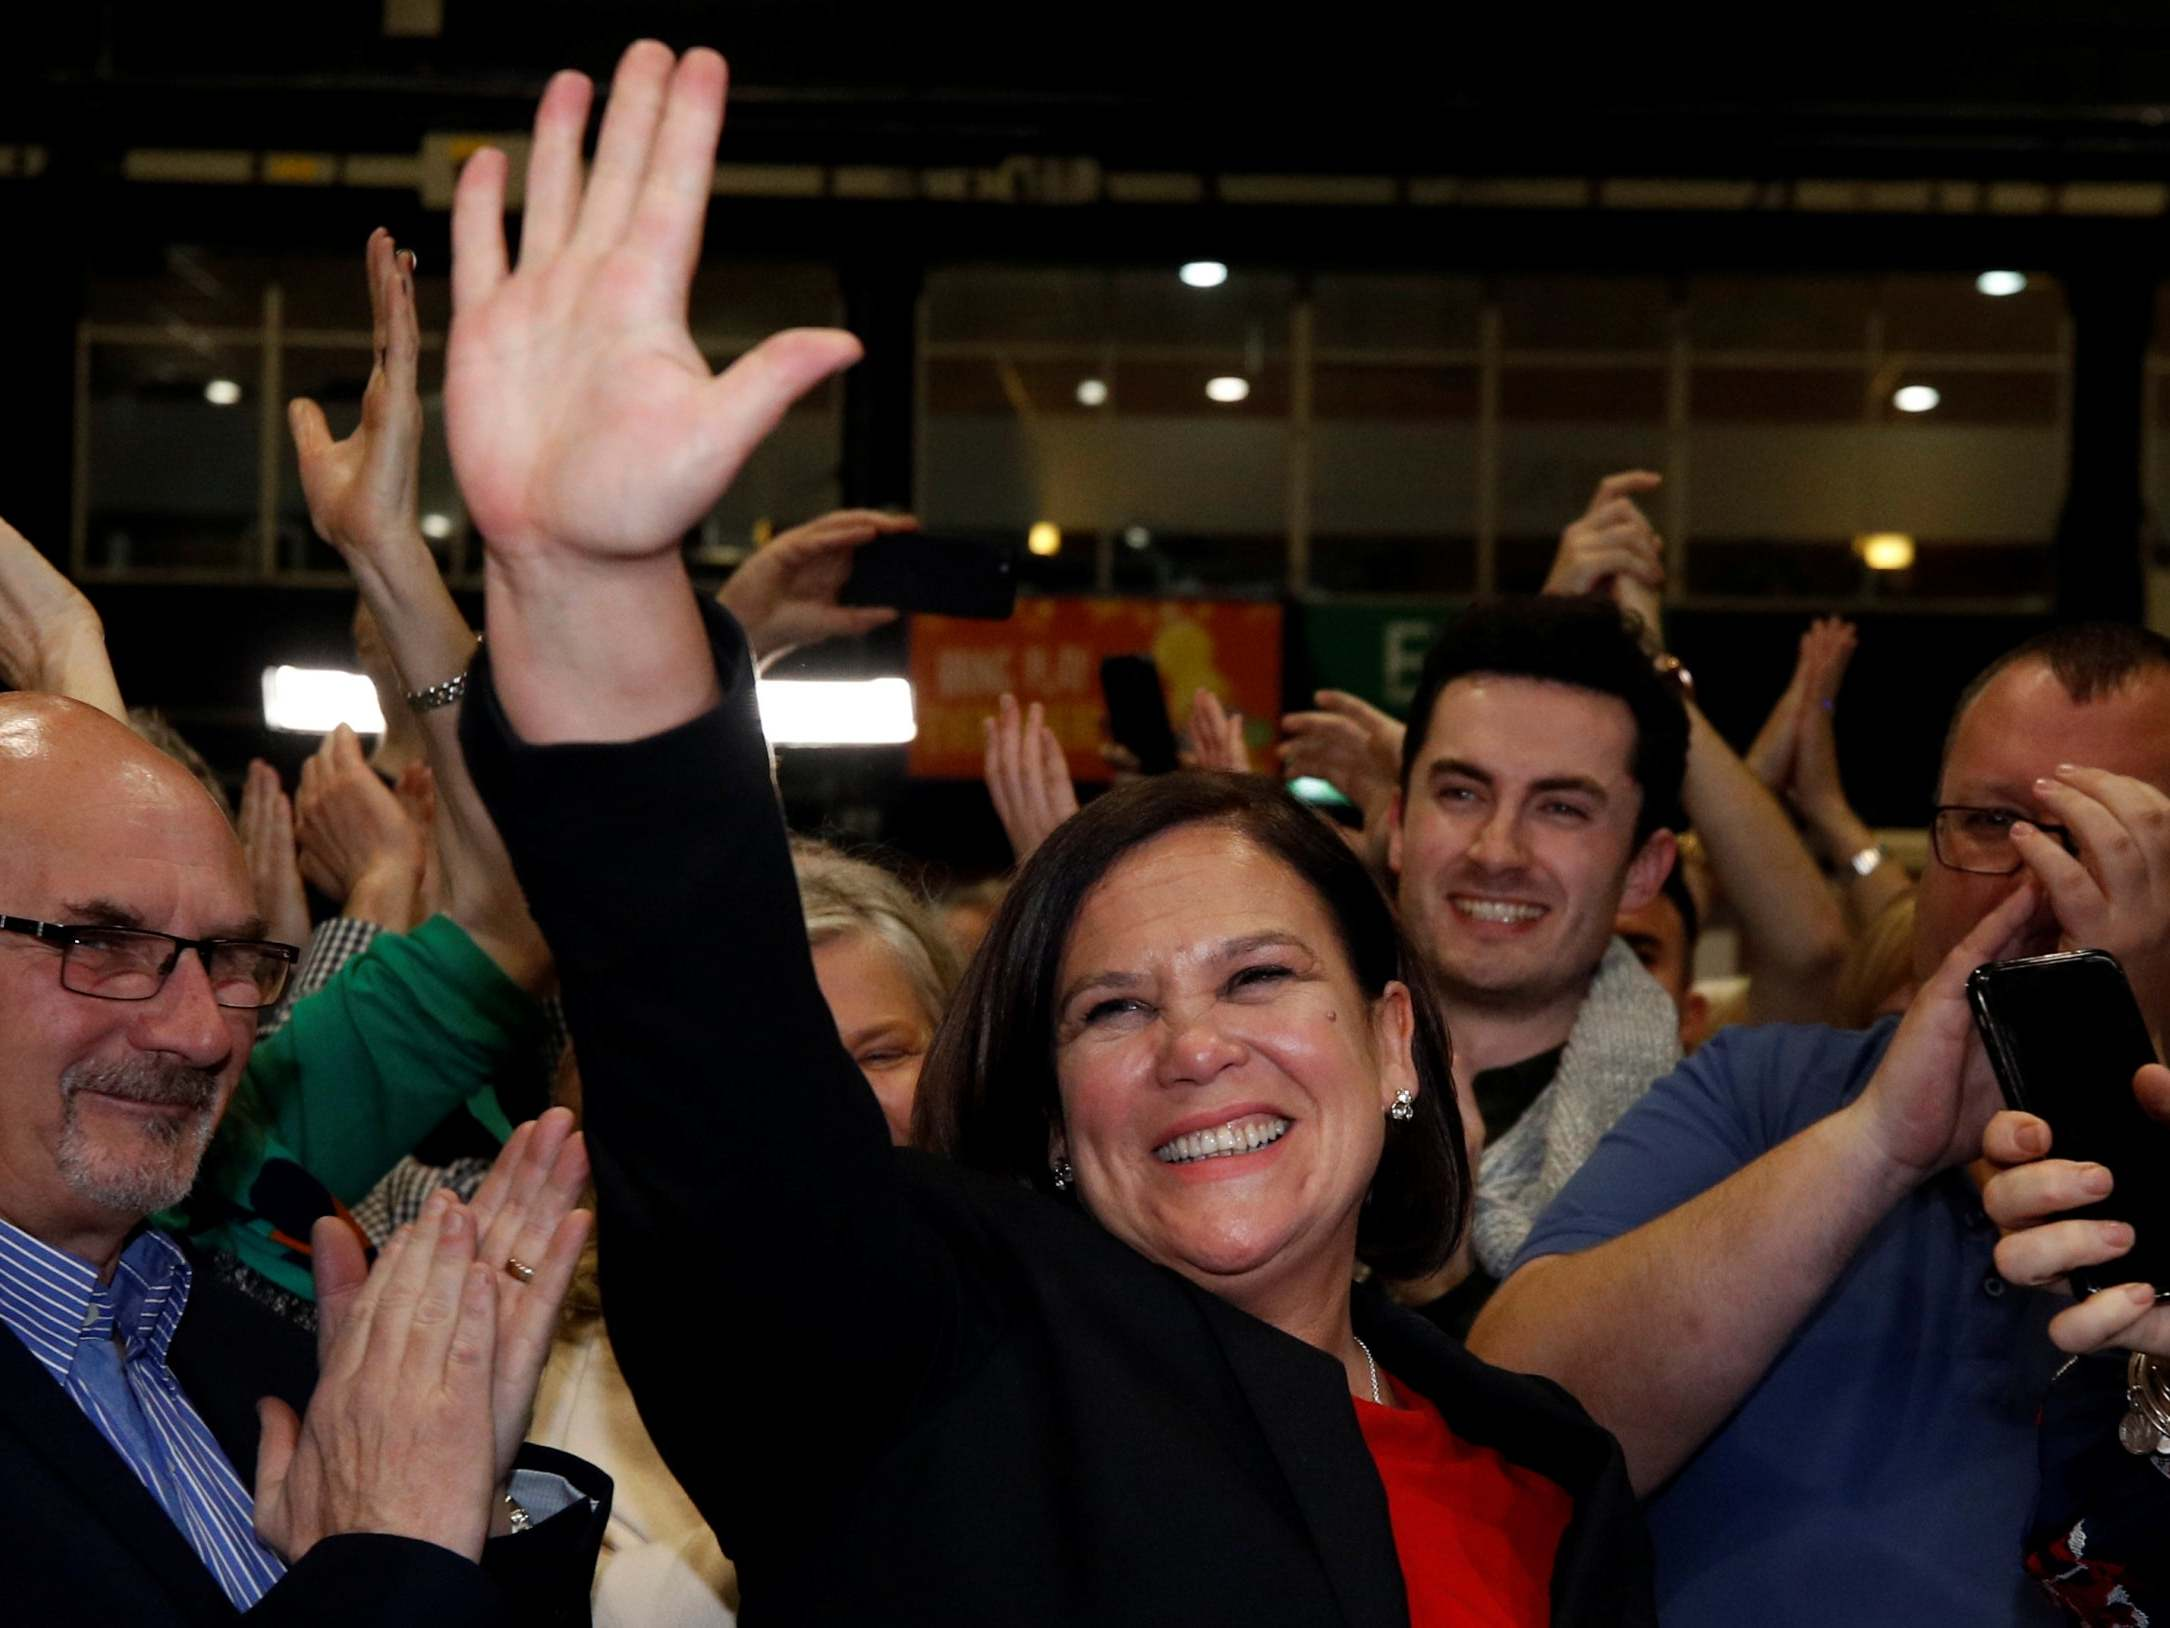 Opinion: Irish pundits should have predicted the Sinn Fein 'earthquake'